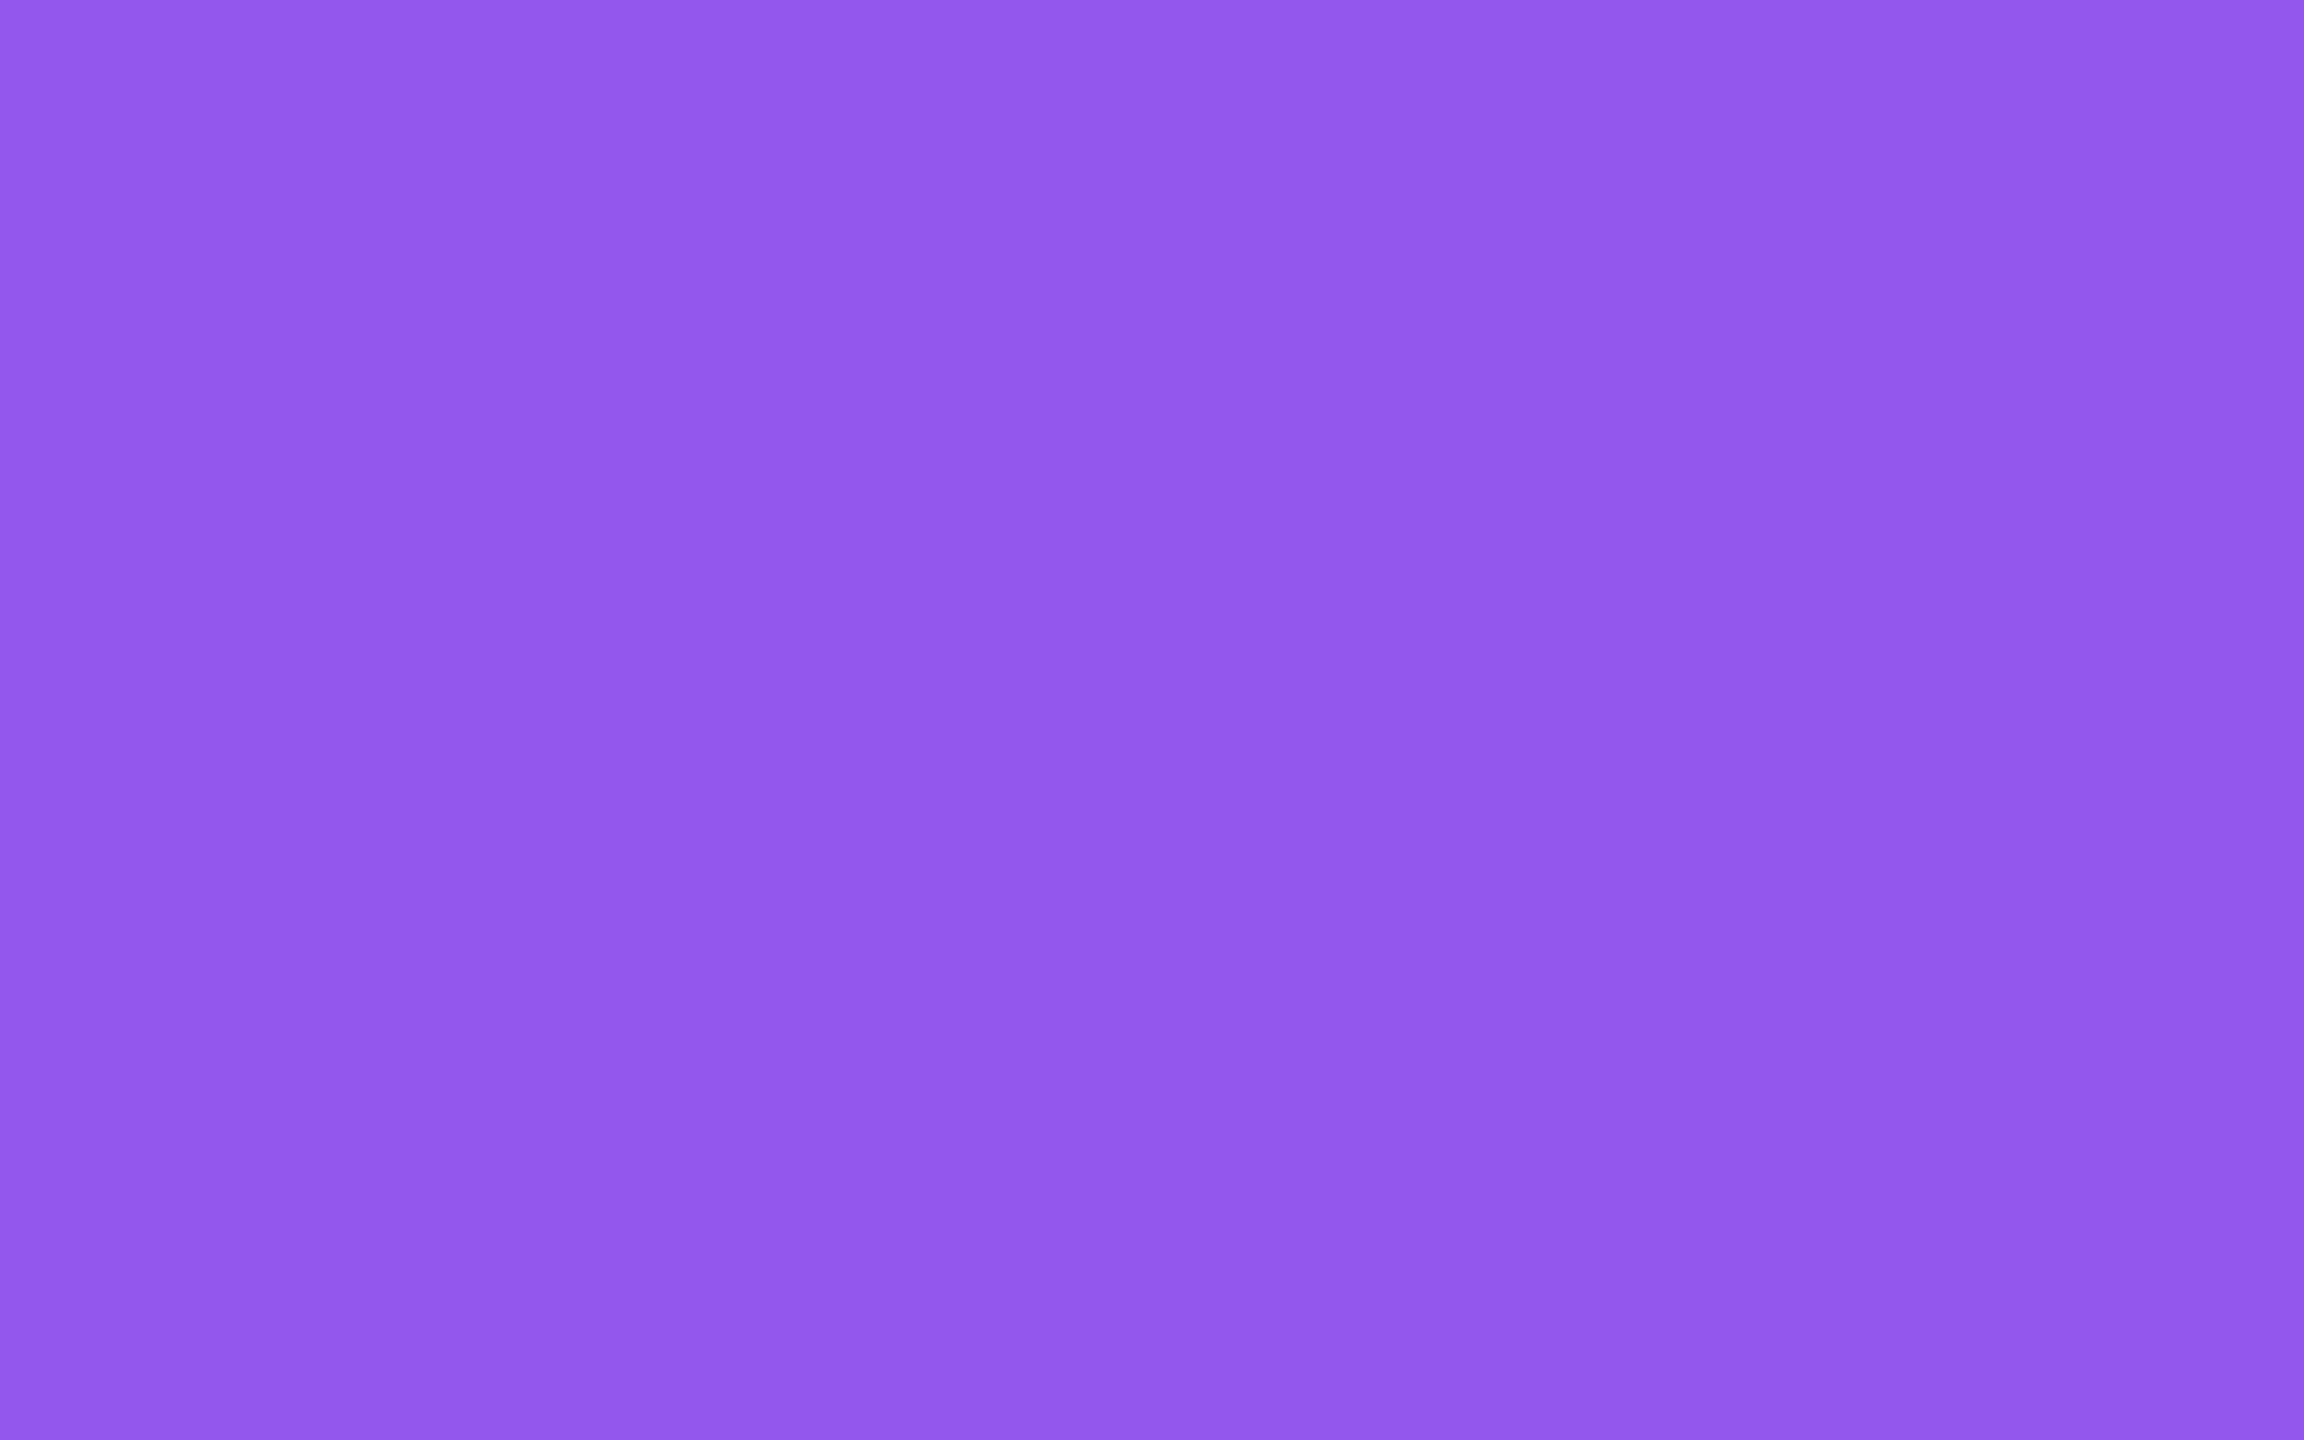 2304x1440 Lavender Indigo Solid Color Background